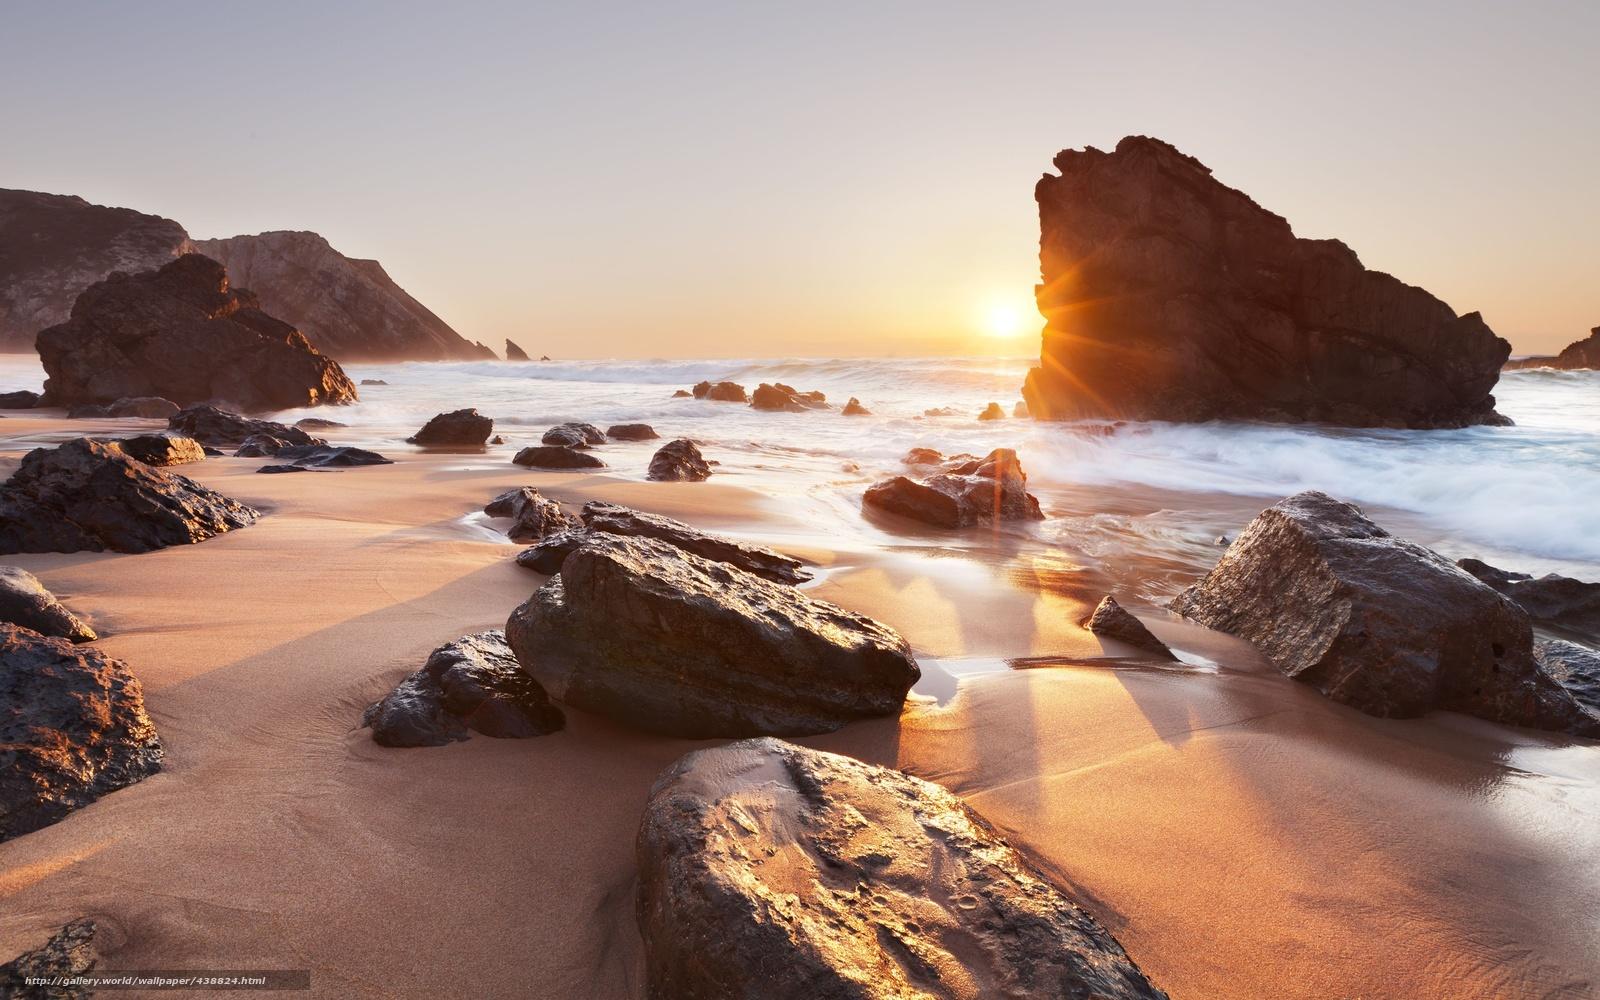 Tlcharger fond d 39 ecran praia da adraga sintra portugal for Fond ecran portugal